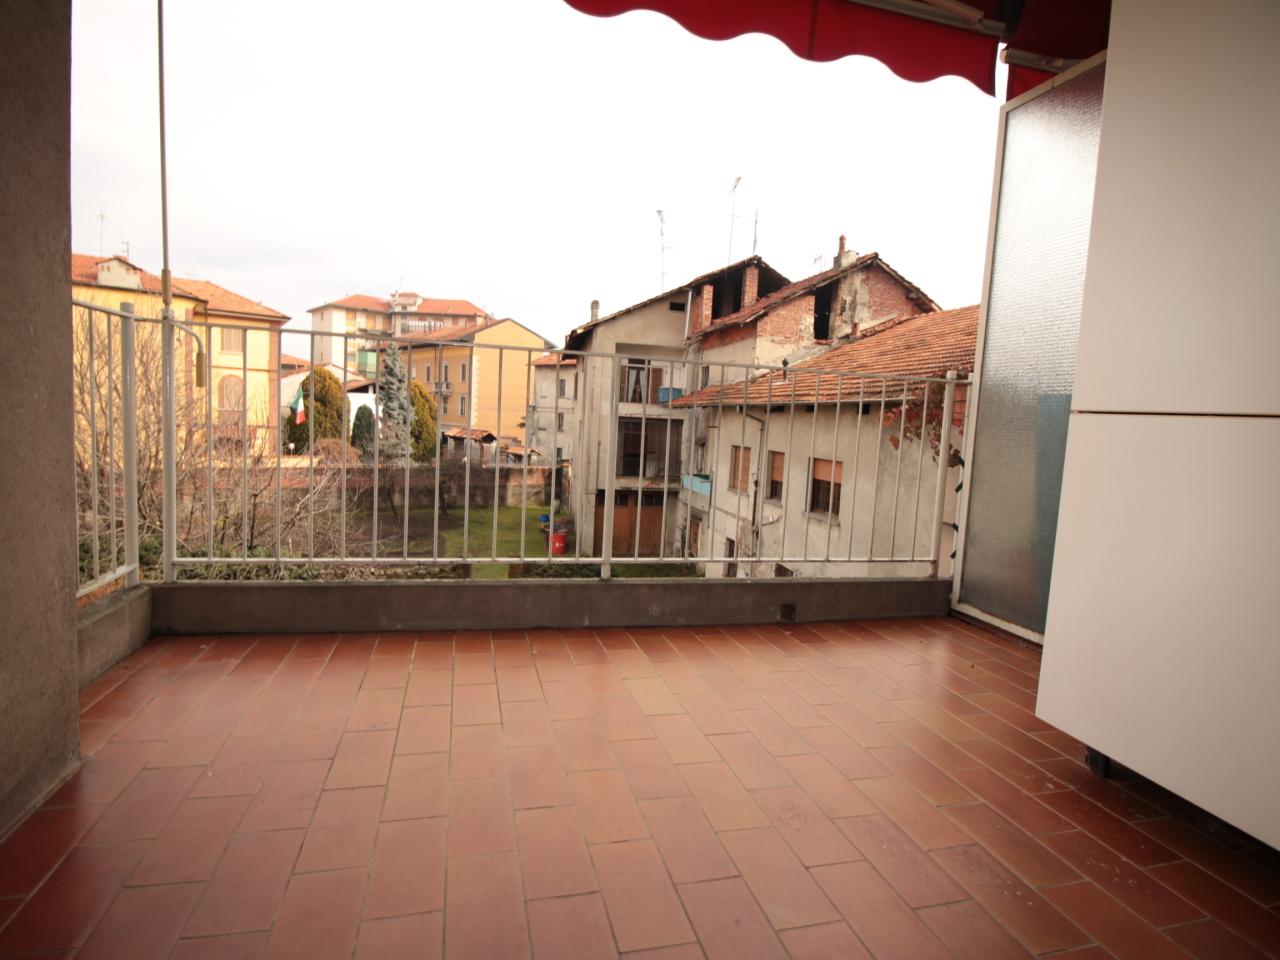 Bilocale Borgomanero Via Piovale 1 12